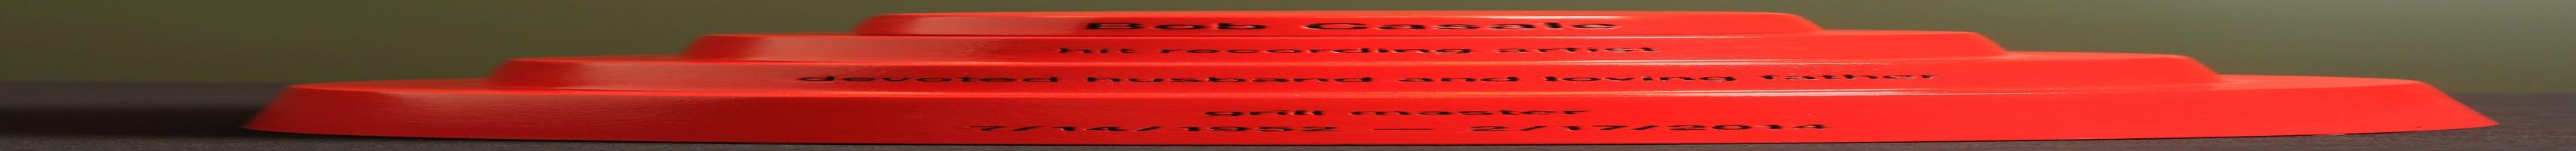 3-D printer helps company create custom urns